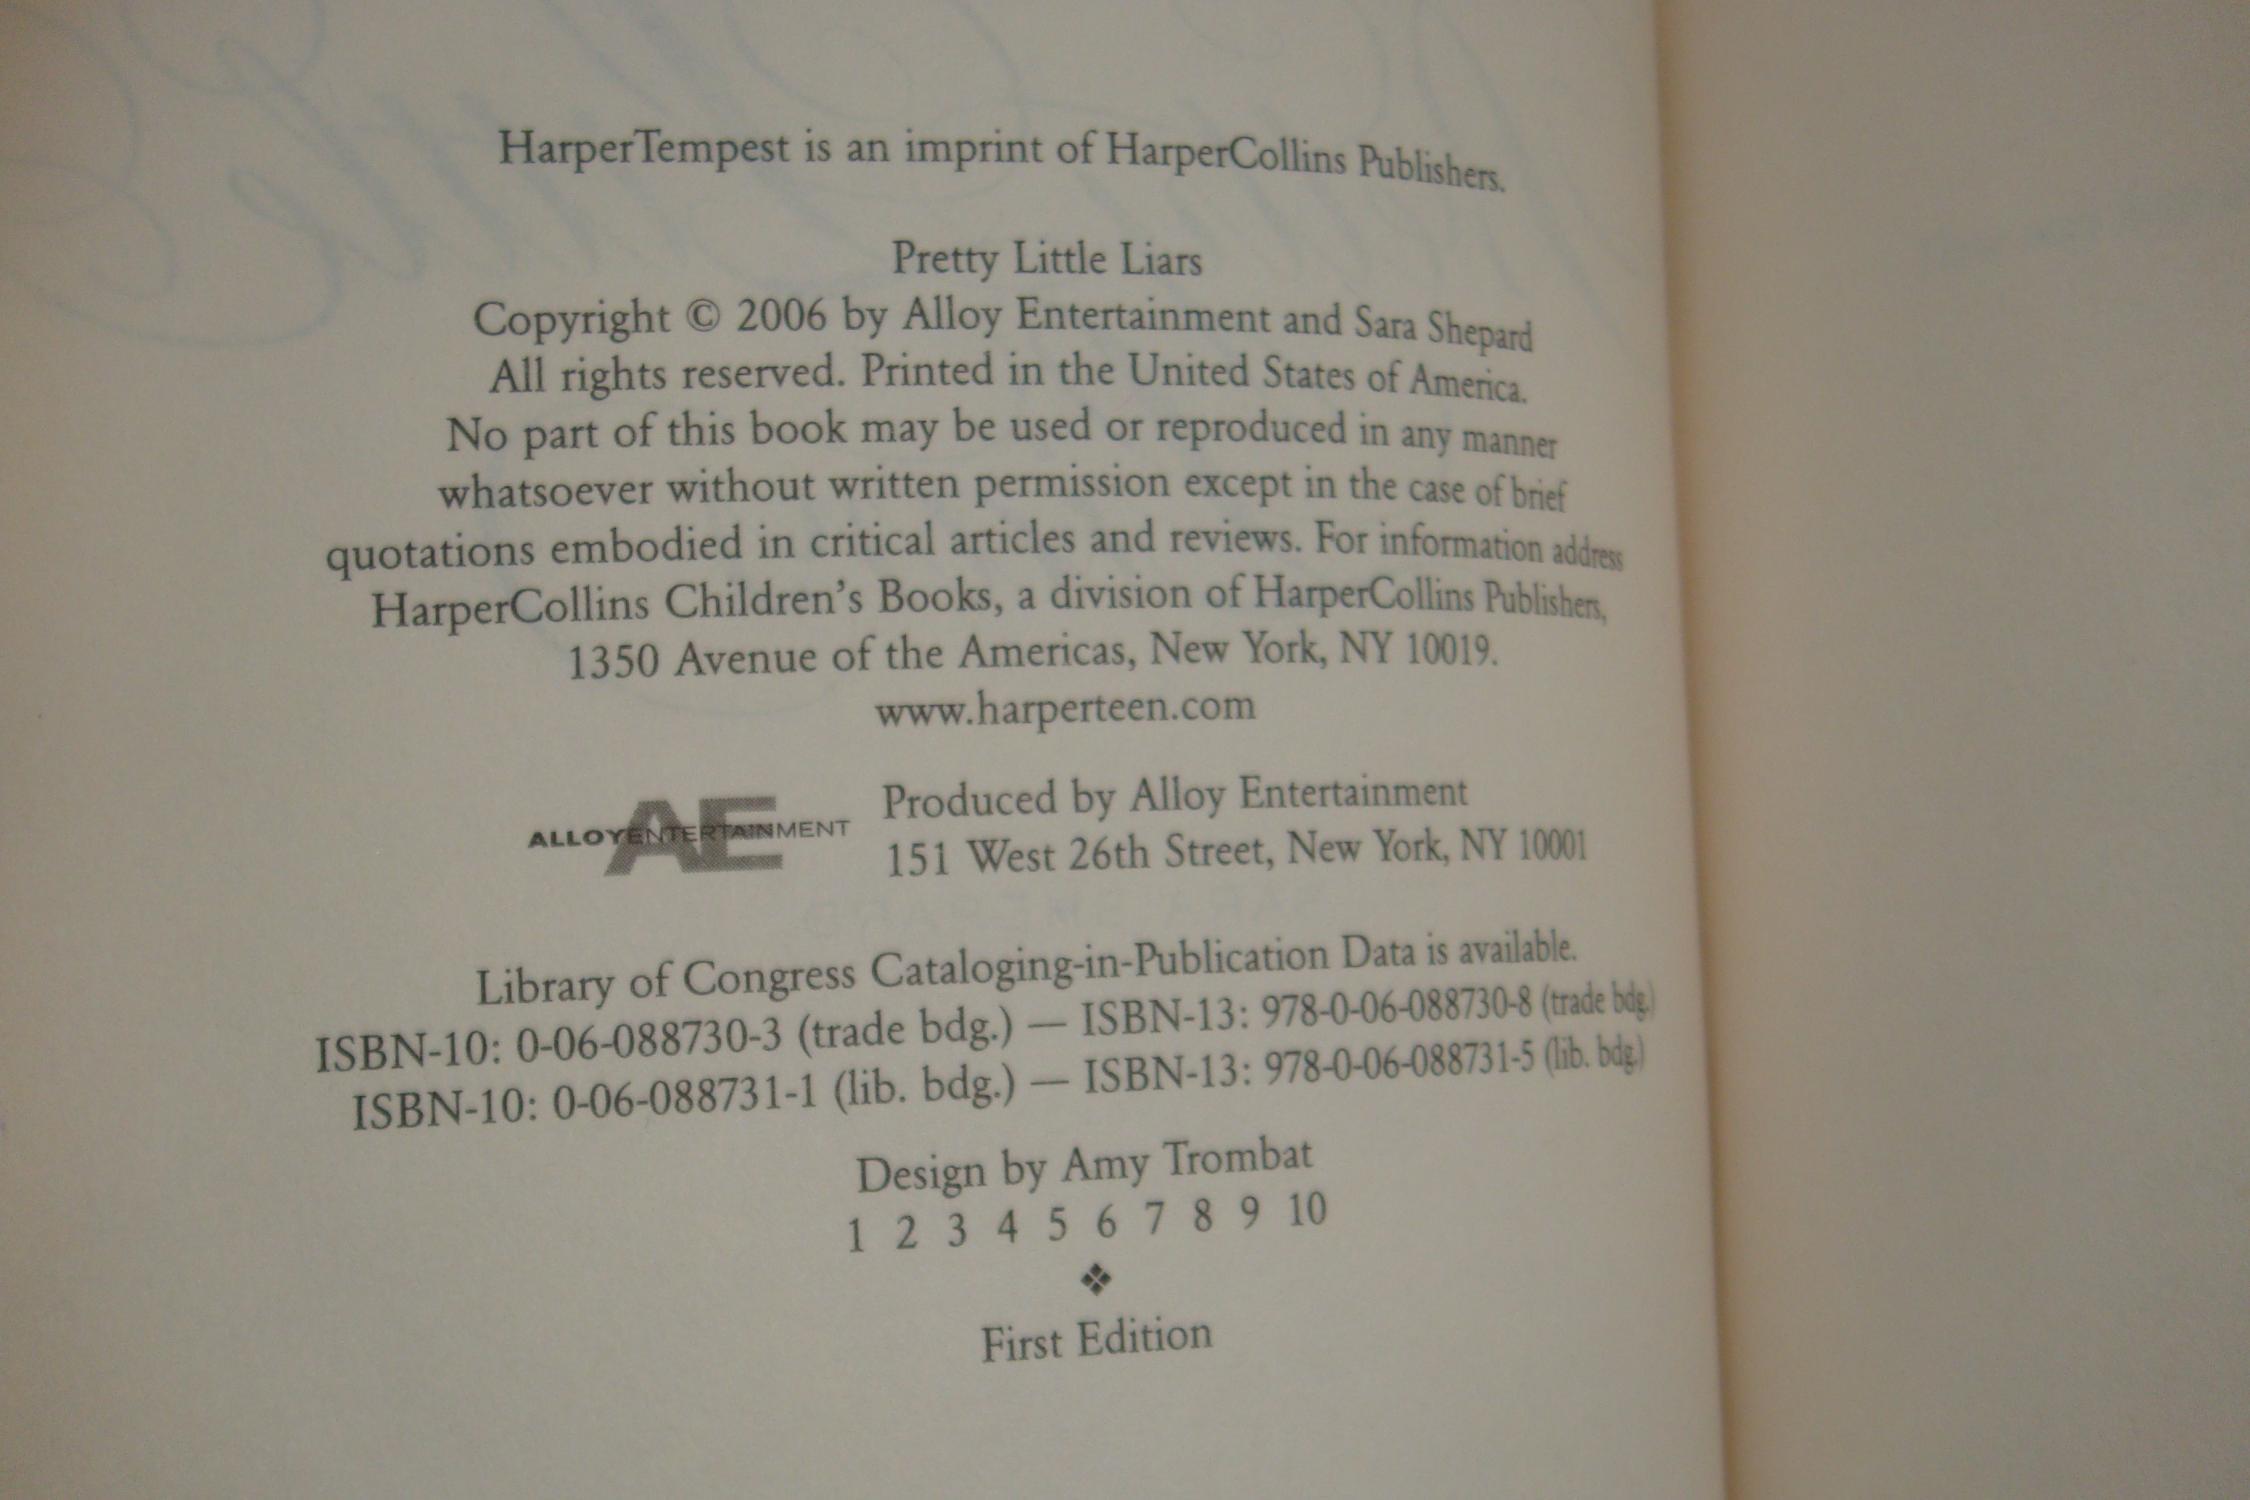 pretty little liars 1st printing by shepard sara harper tempest